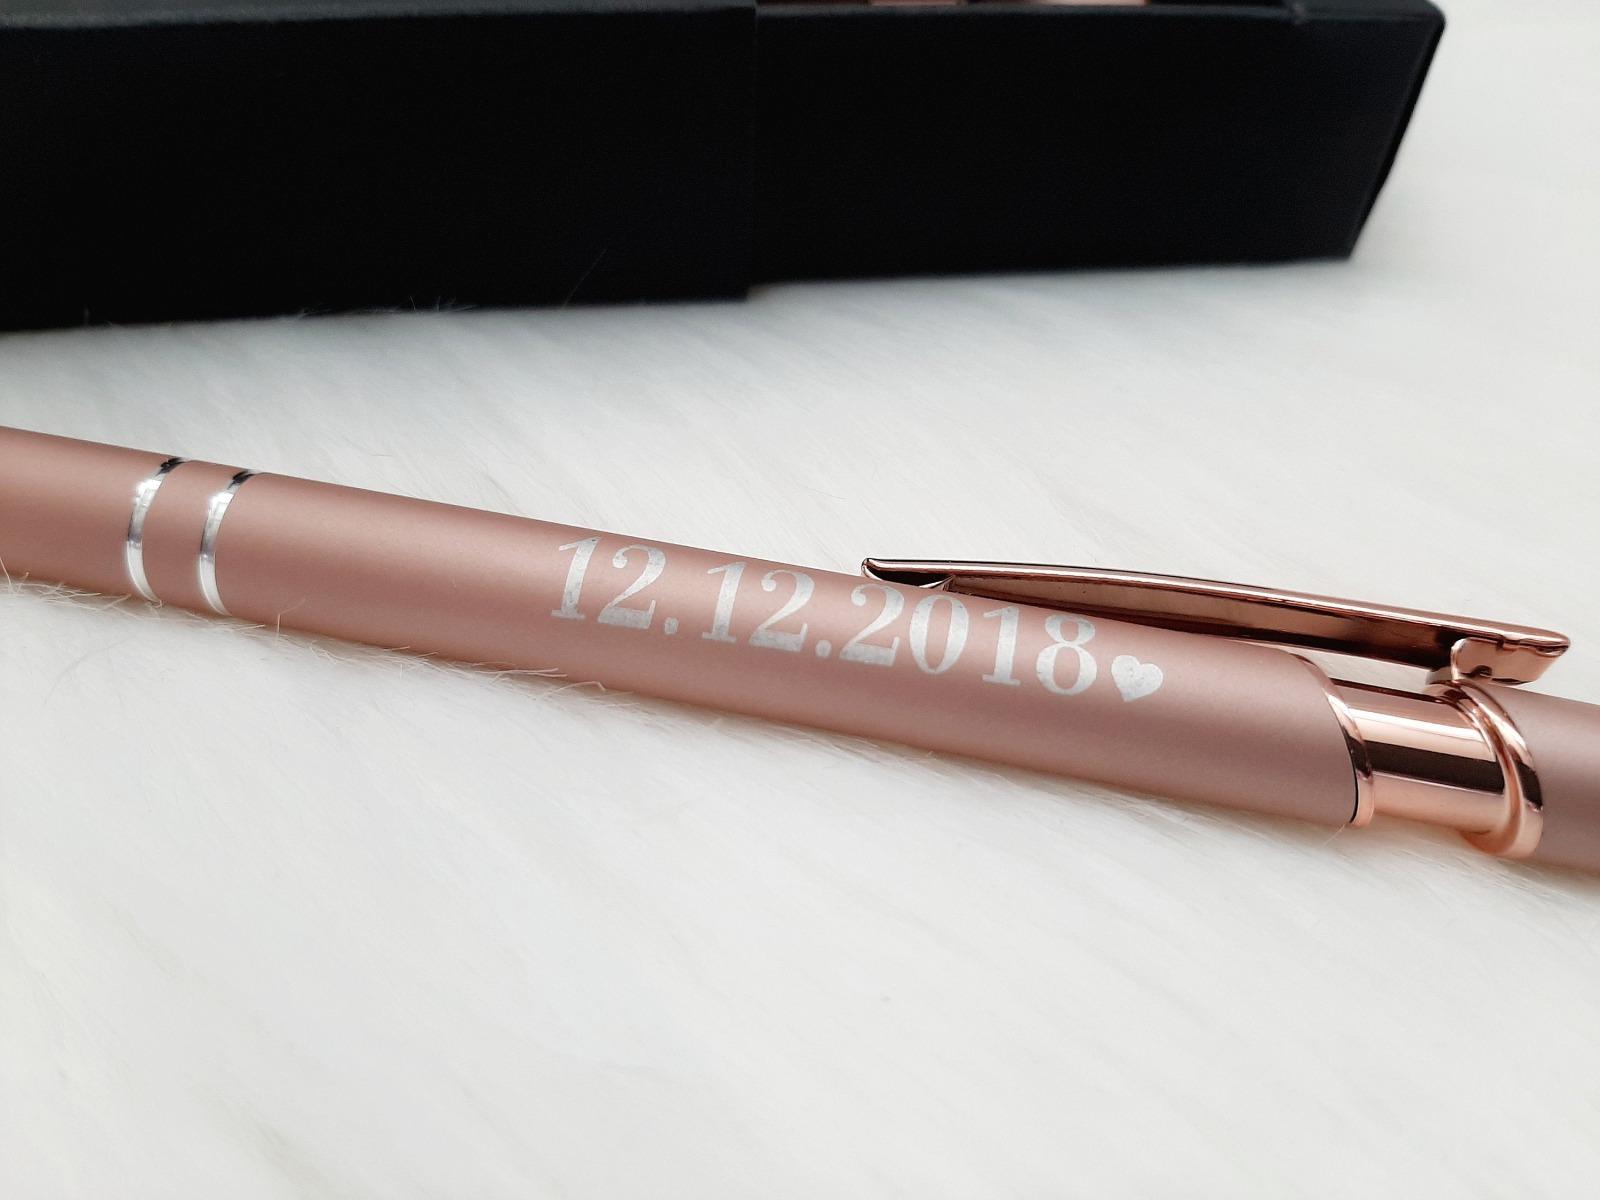 Kugelschreiber mit Name & Geschenkverpackung 6